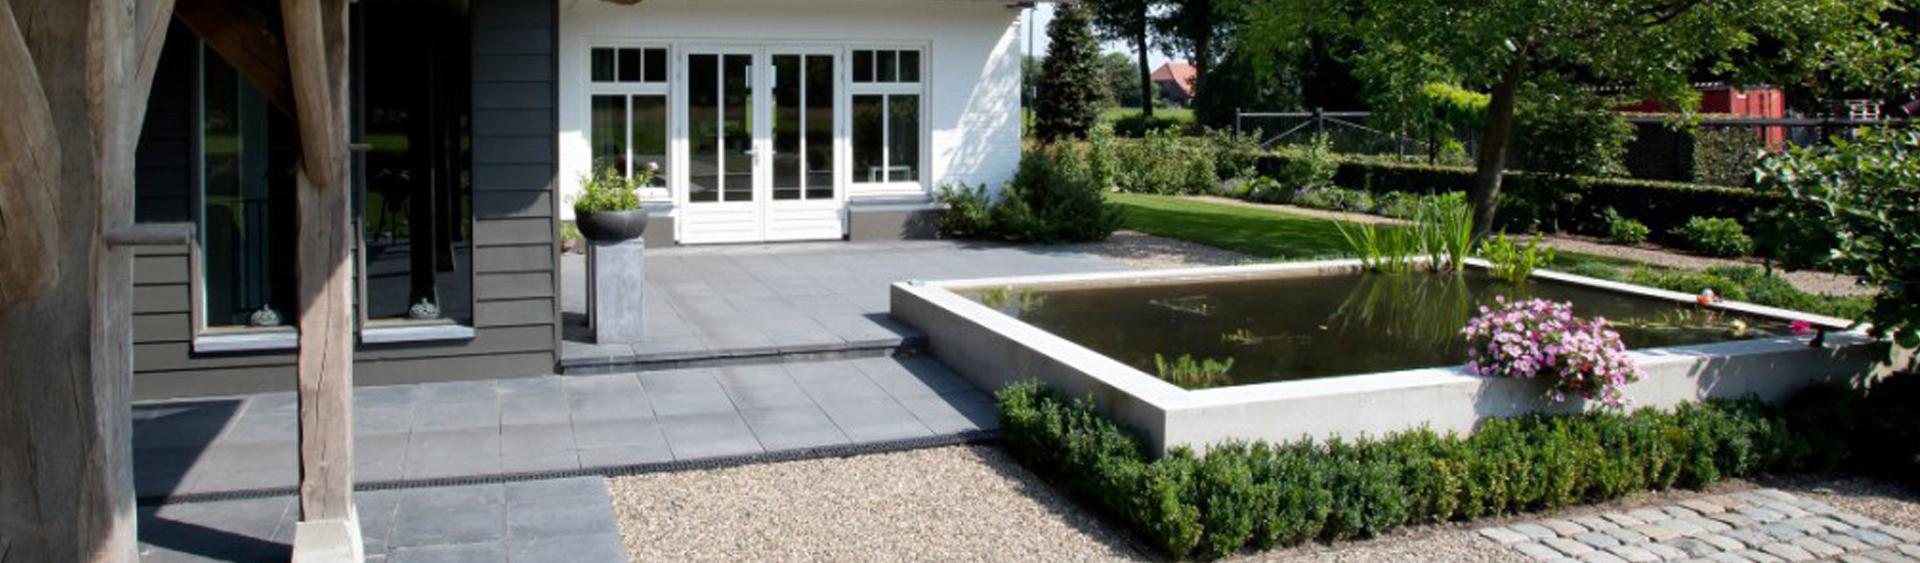 Particuliere tuinen korsian tuinontwerp en aanleg for Tuinontwerp en aanleg